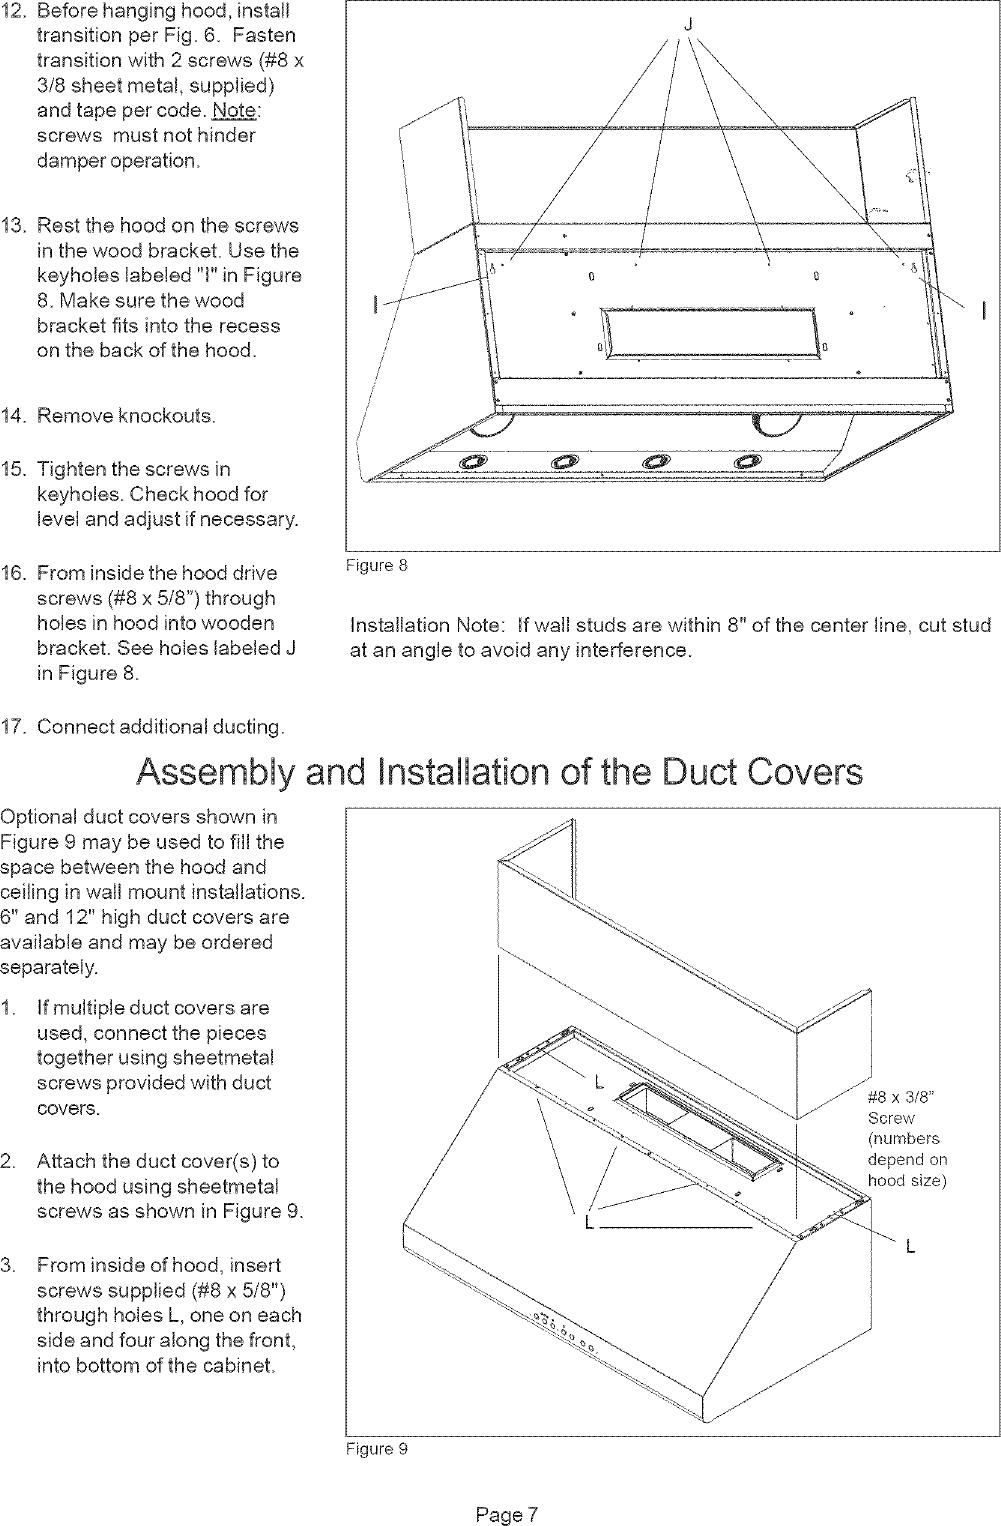 Thermador range hood manual l0512045 page 7 of 12 thermador range hood manual l0512045 asfbconference2016 Gallery